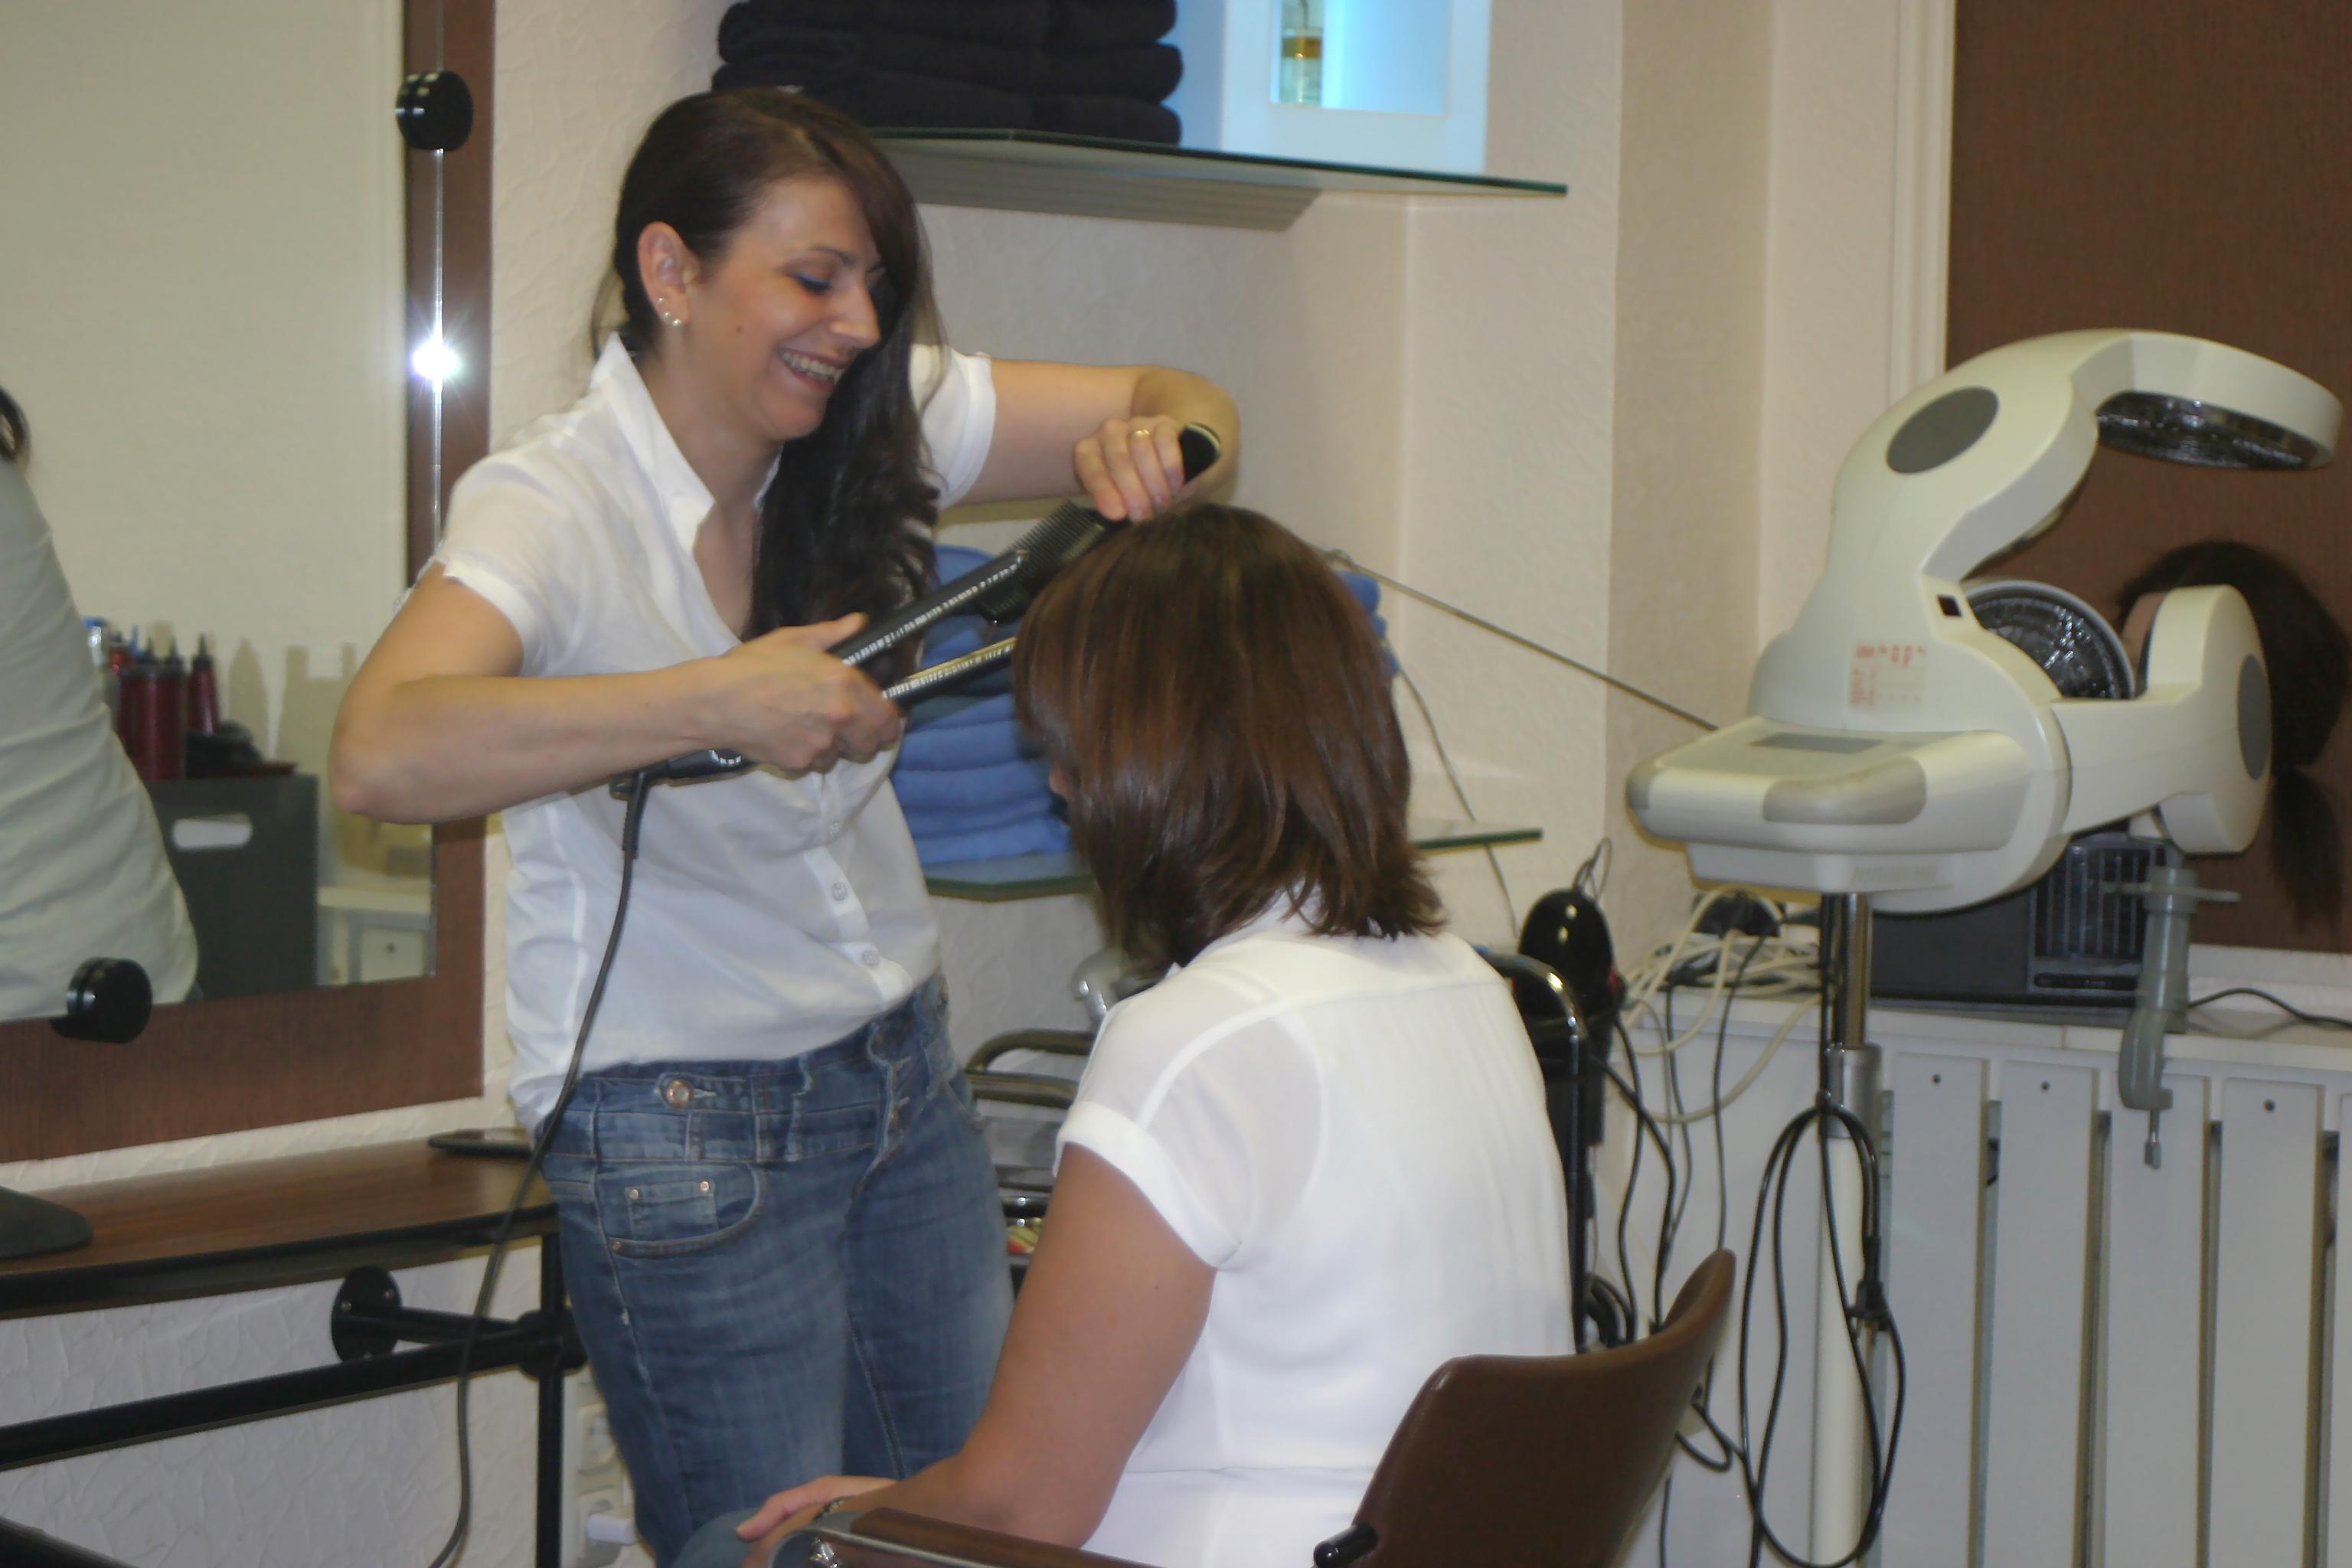 Friseur bel hair fris re grevenbroich deutschland for Salon bel hair